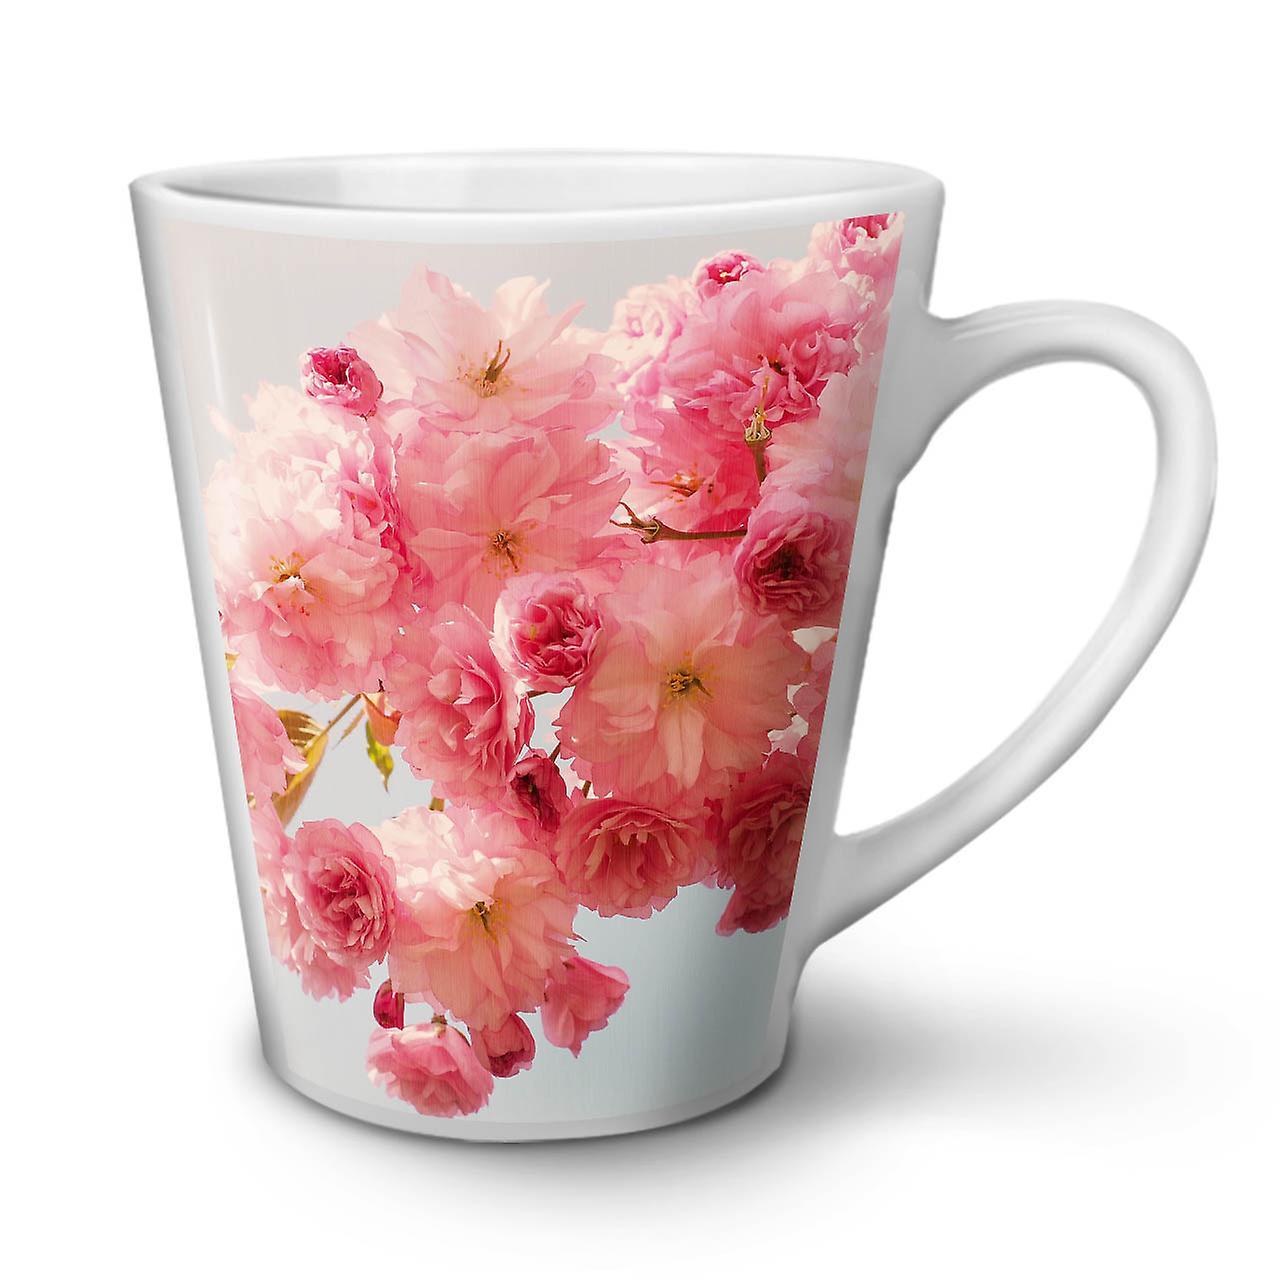 Nouveau En Vie OzWellcoda Latte 12 Blanc Peone Mug Thé Céramique Café Rose fymIY76vbg